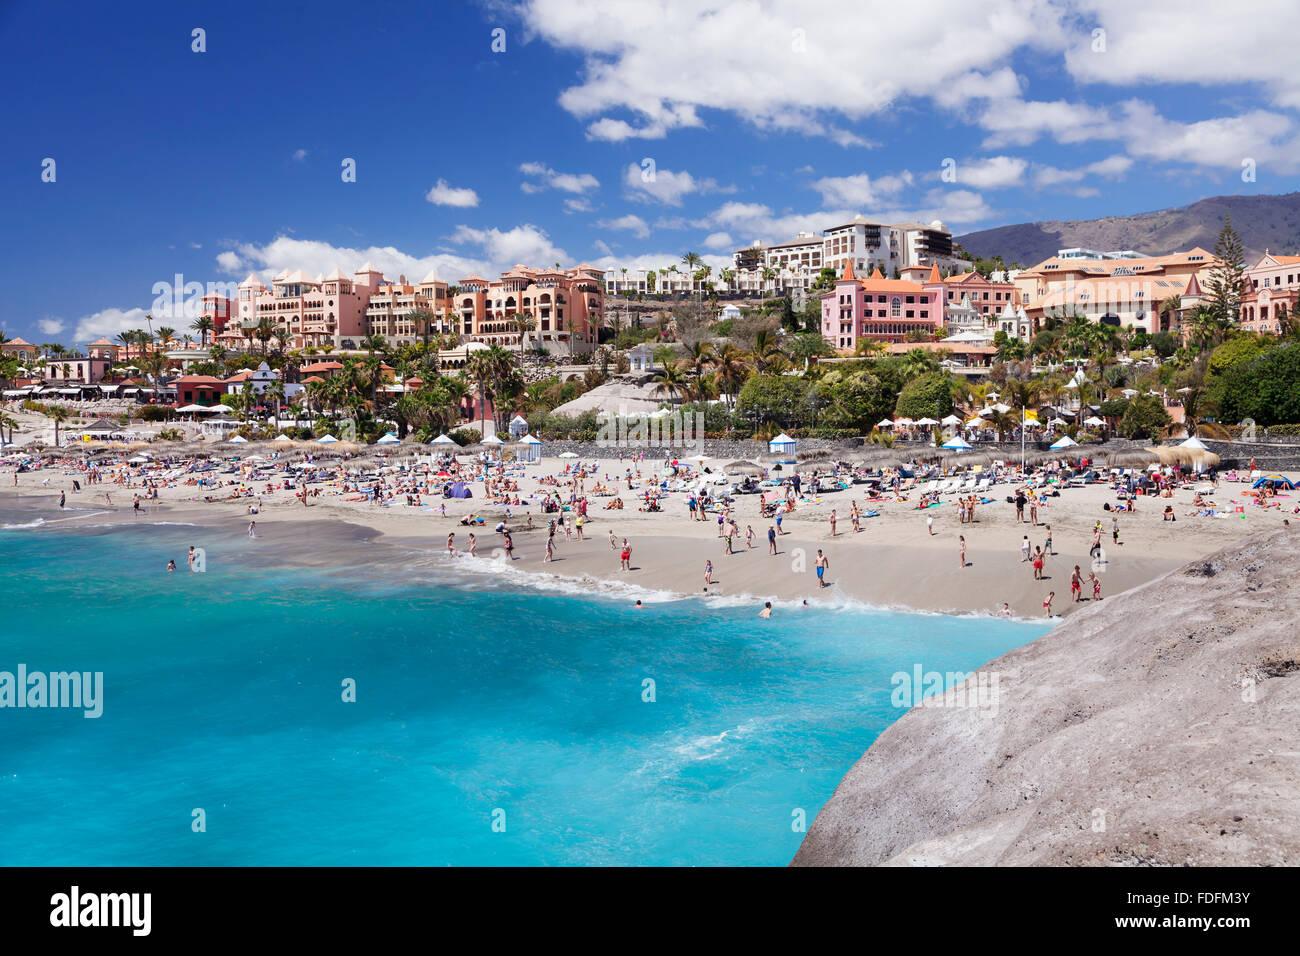 Playa del Duque beach, Costa Adeje, Tenerife, Canary Islands, Spain Stock Pho...